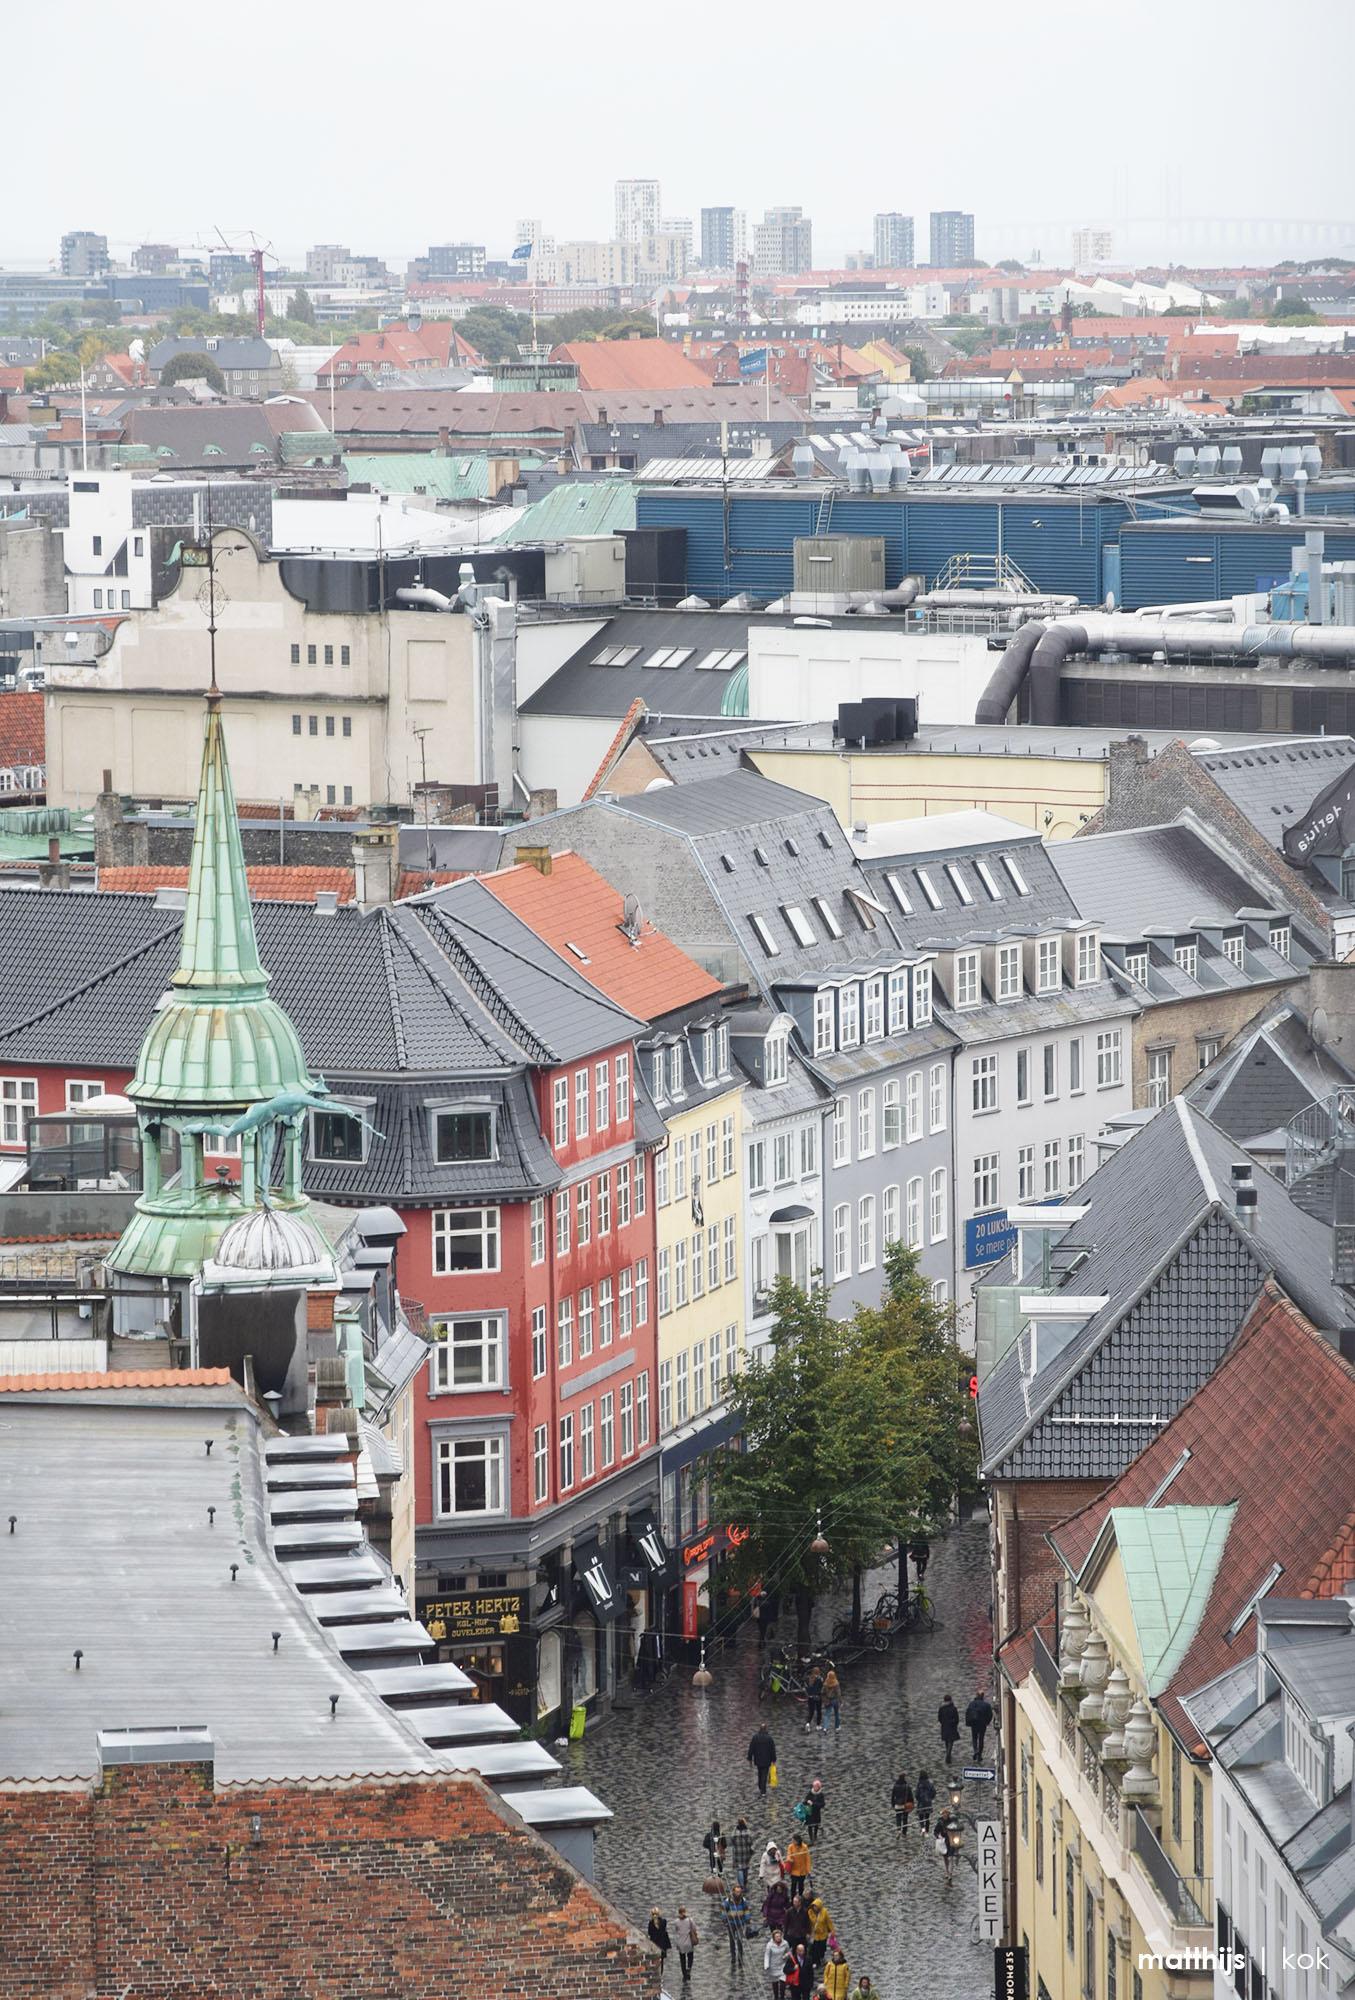 Copenhagen, Denmark | Photo by Matthijs Kok